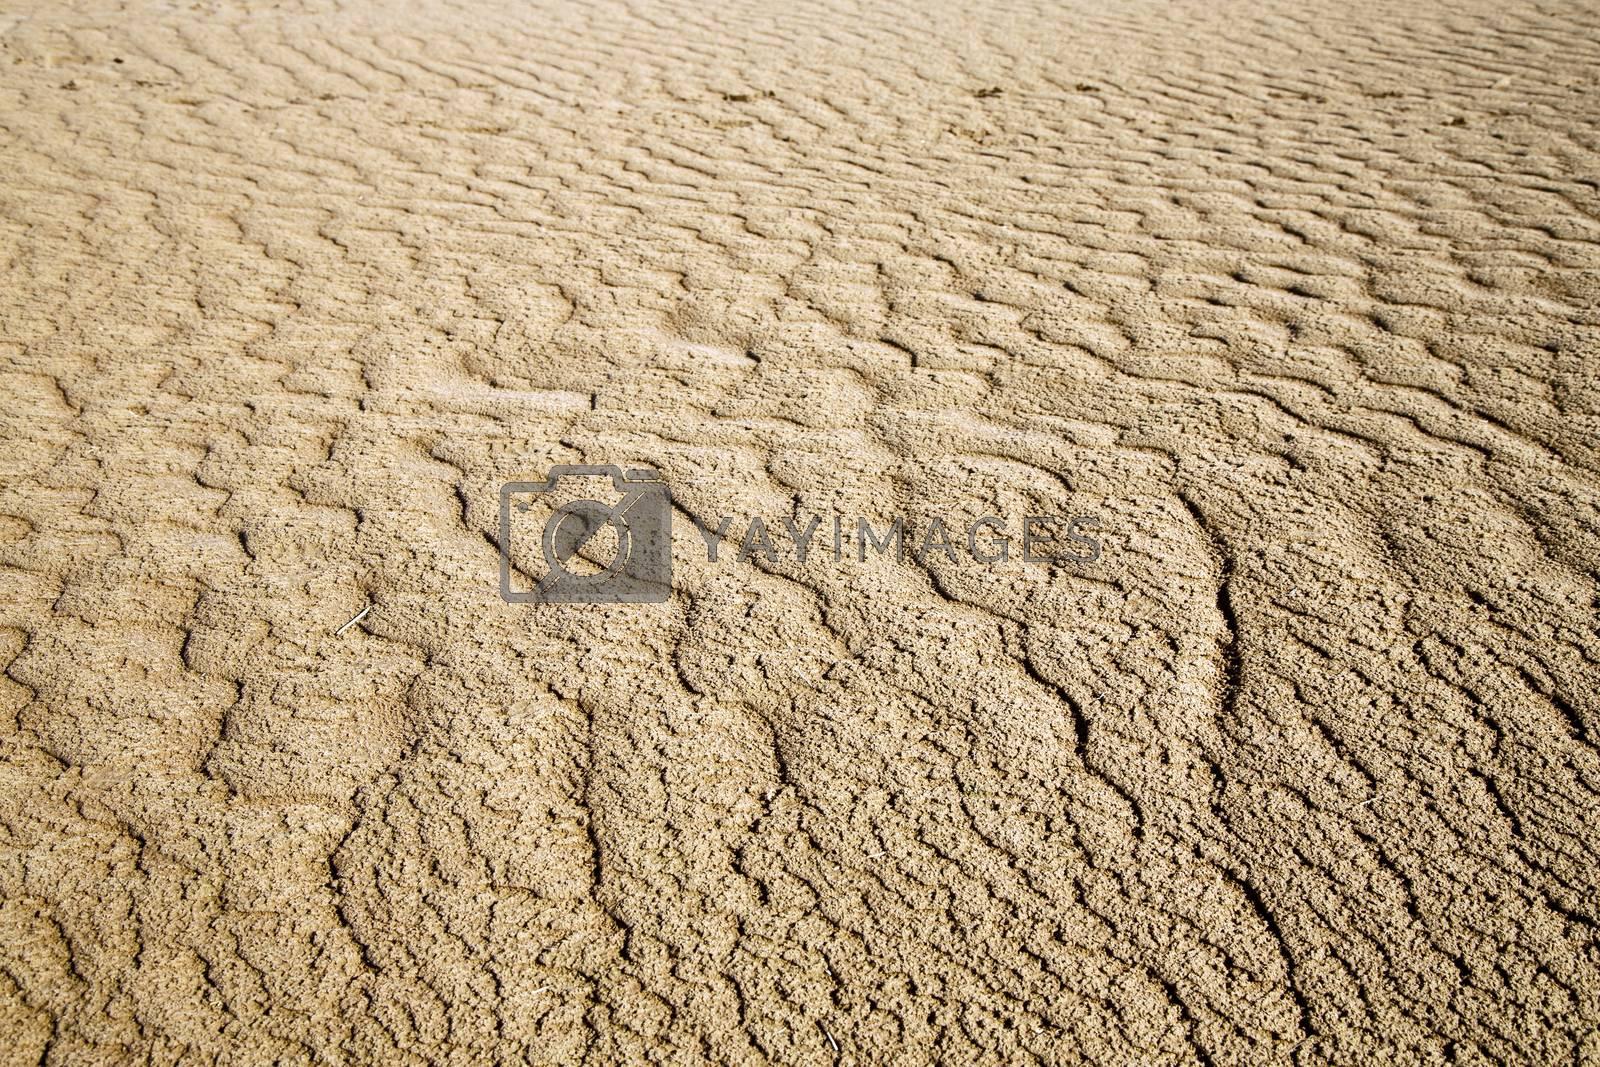 afric  brown   dune   sahara t line by lkpro